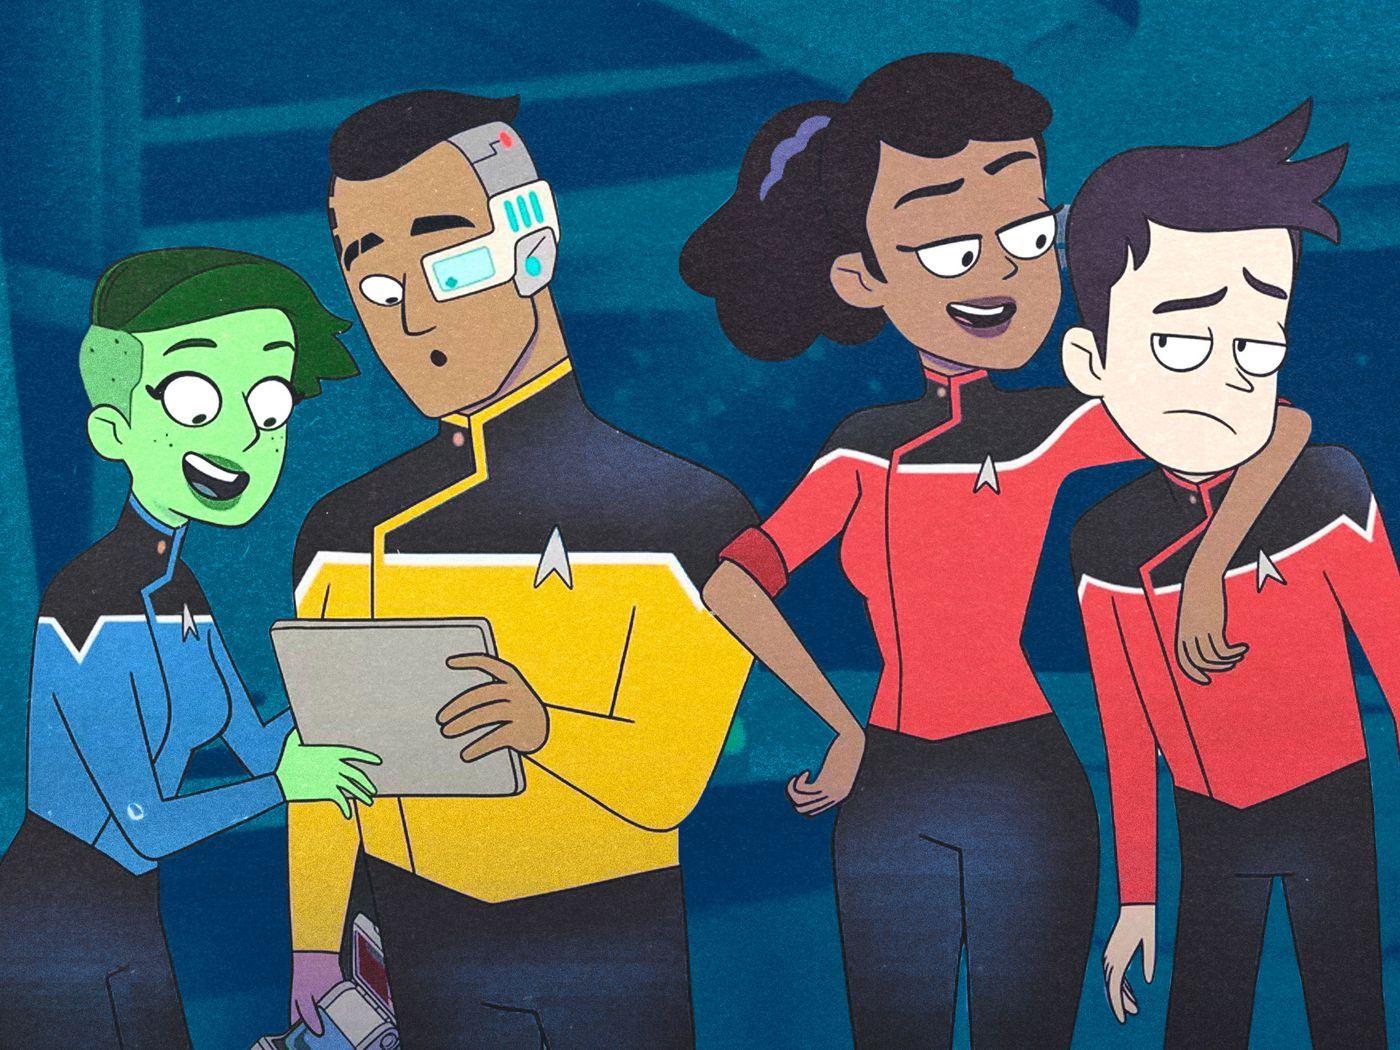 Did Cbs Finally Get Star Trek Right In Cartoon Comedy Lower Decks Film Daily